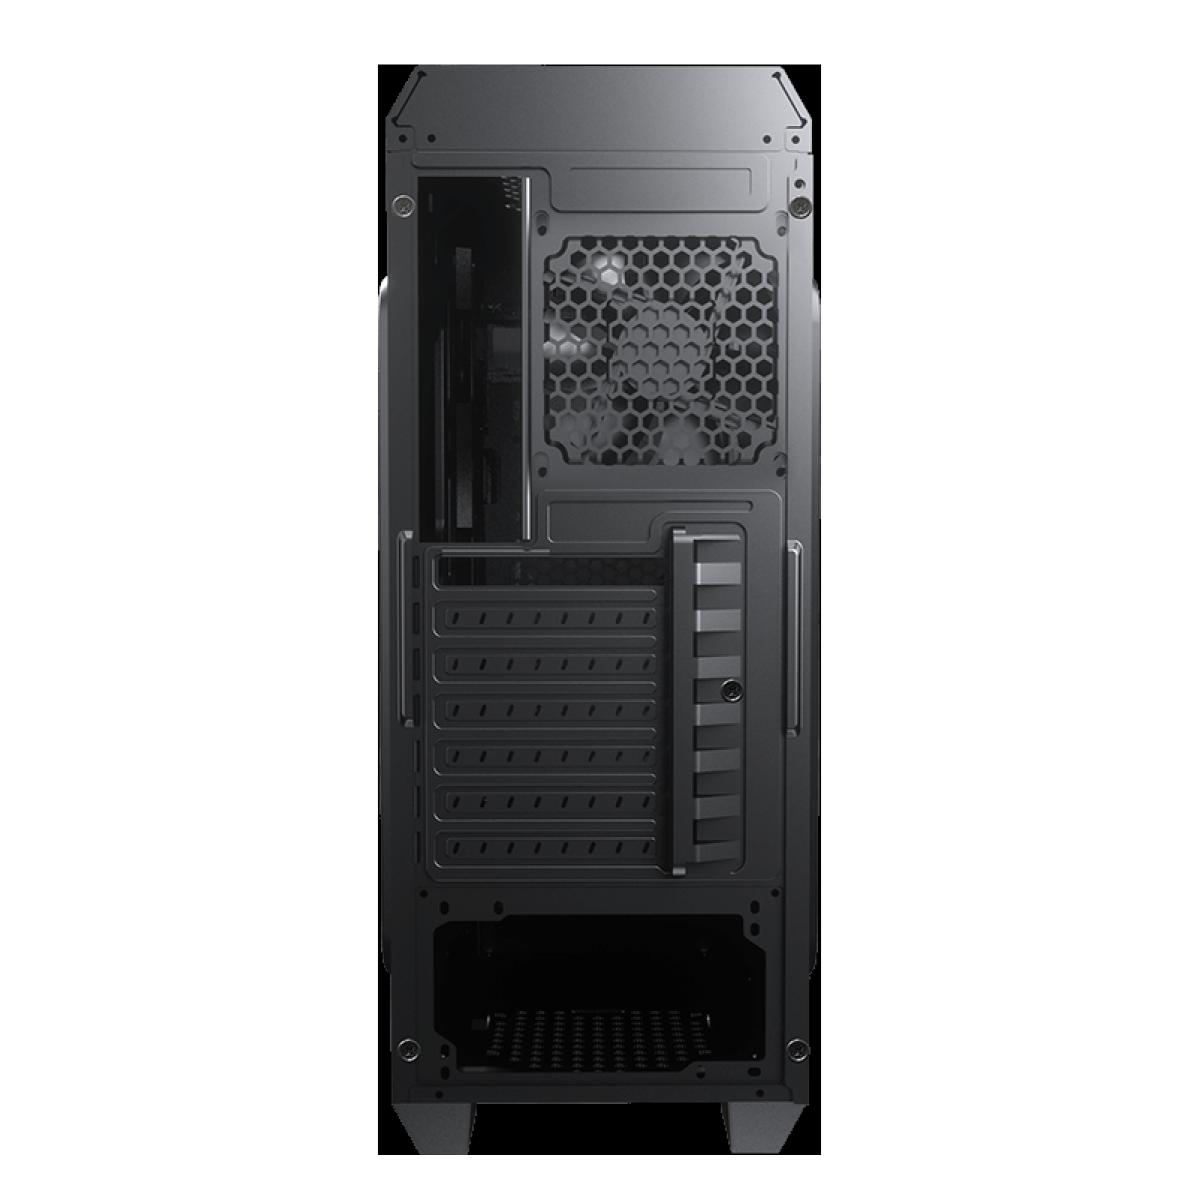 Gabinete Gamer Cougar, MX331 Mesh-X, Mid Tower, Black, ATX, Sem Fonte, Com 1 Fan, 385NC20.0001